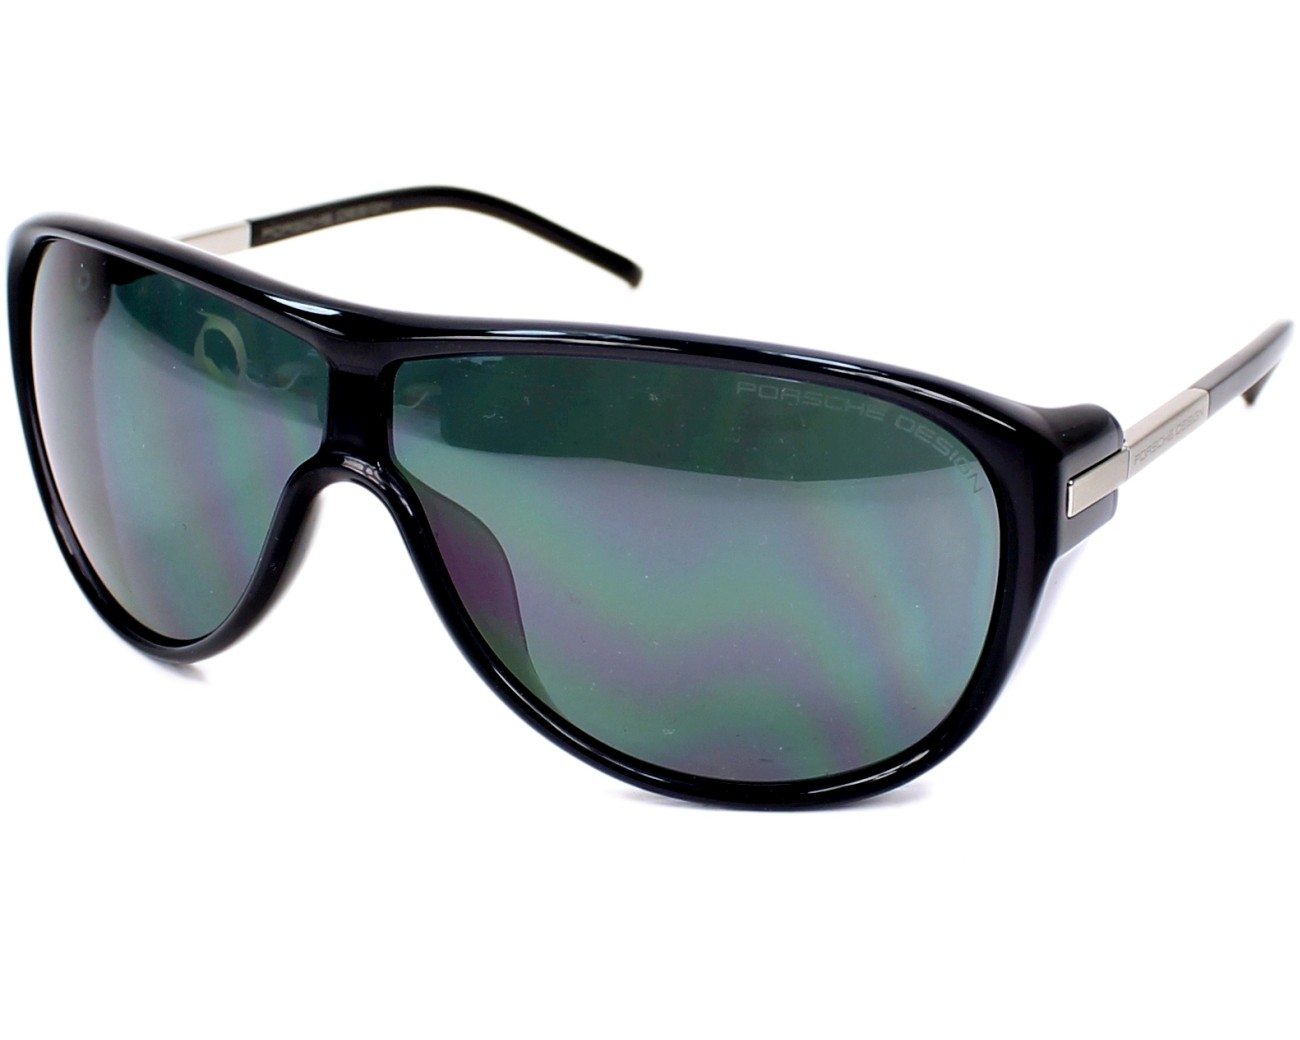 lunettes de soleil porsche design p 8598 a bleu denim visionet. Black Bedroom Furniture Sets. Home Design Ideas